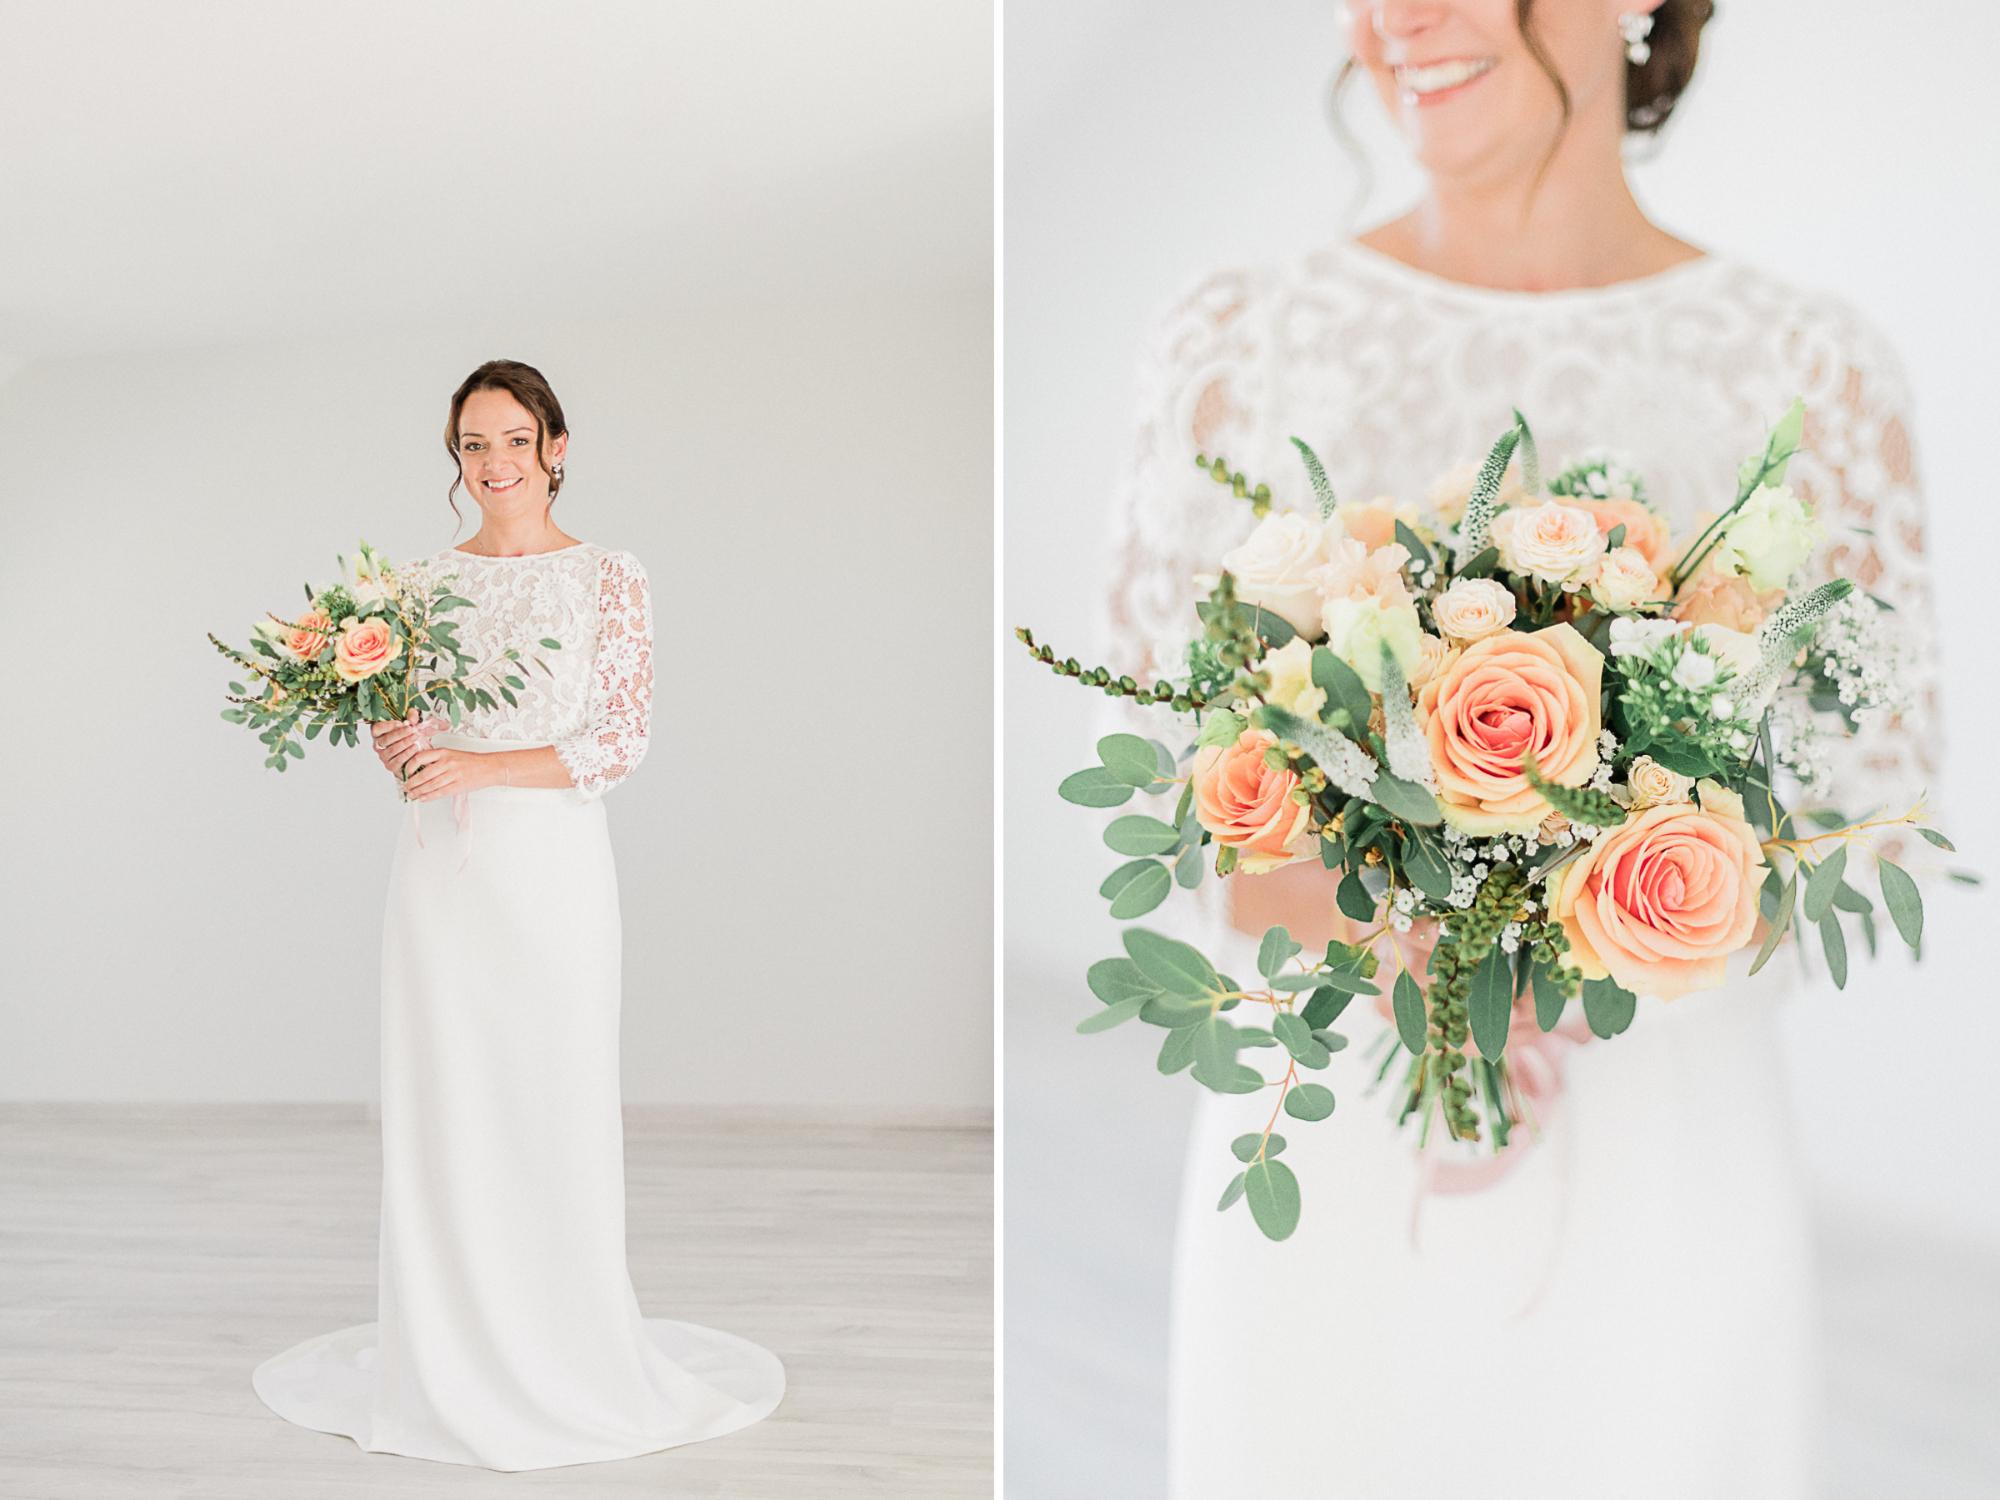 priscillapuzenat-photographe-mariage-bazoches-chateau-nievre-morvan-bourgogne-bouquet-robe